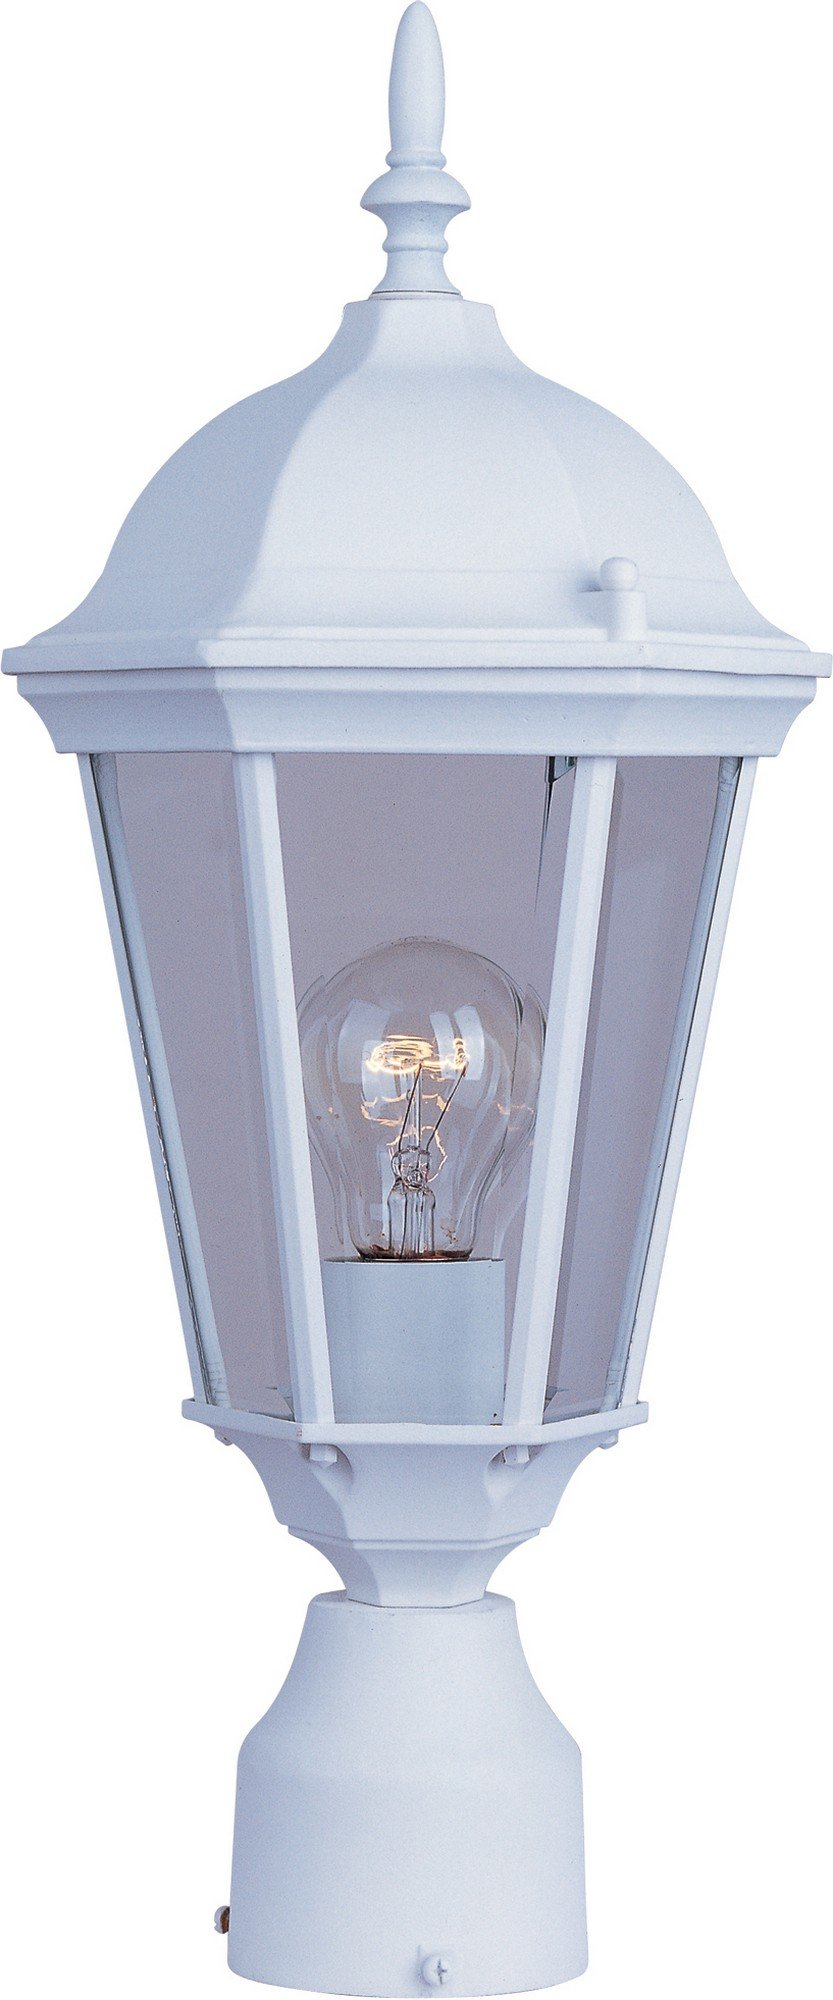 Maxim Lighting 1001 Westlake Outdoor Pole/Post Mount Lantern, White Finish, 8 by 19-Inch by Maxim Lighting